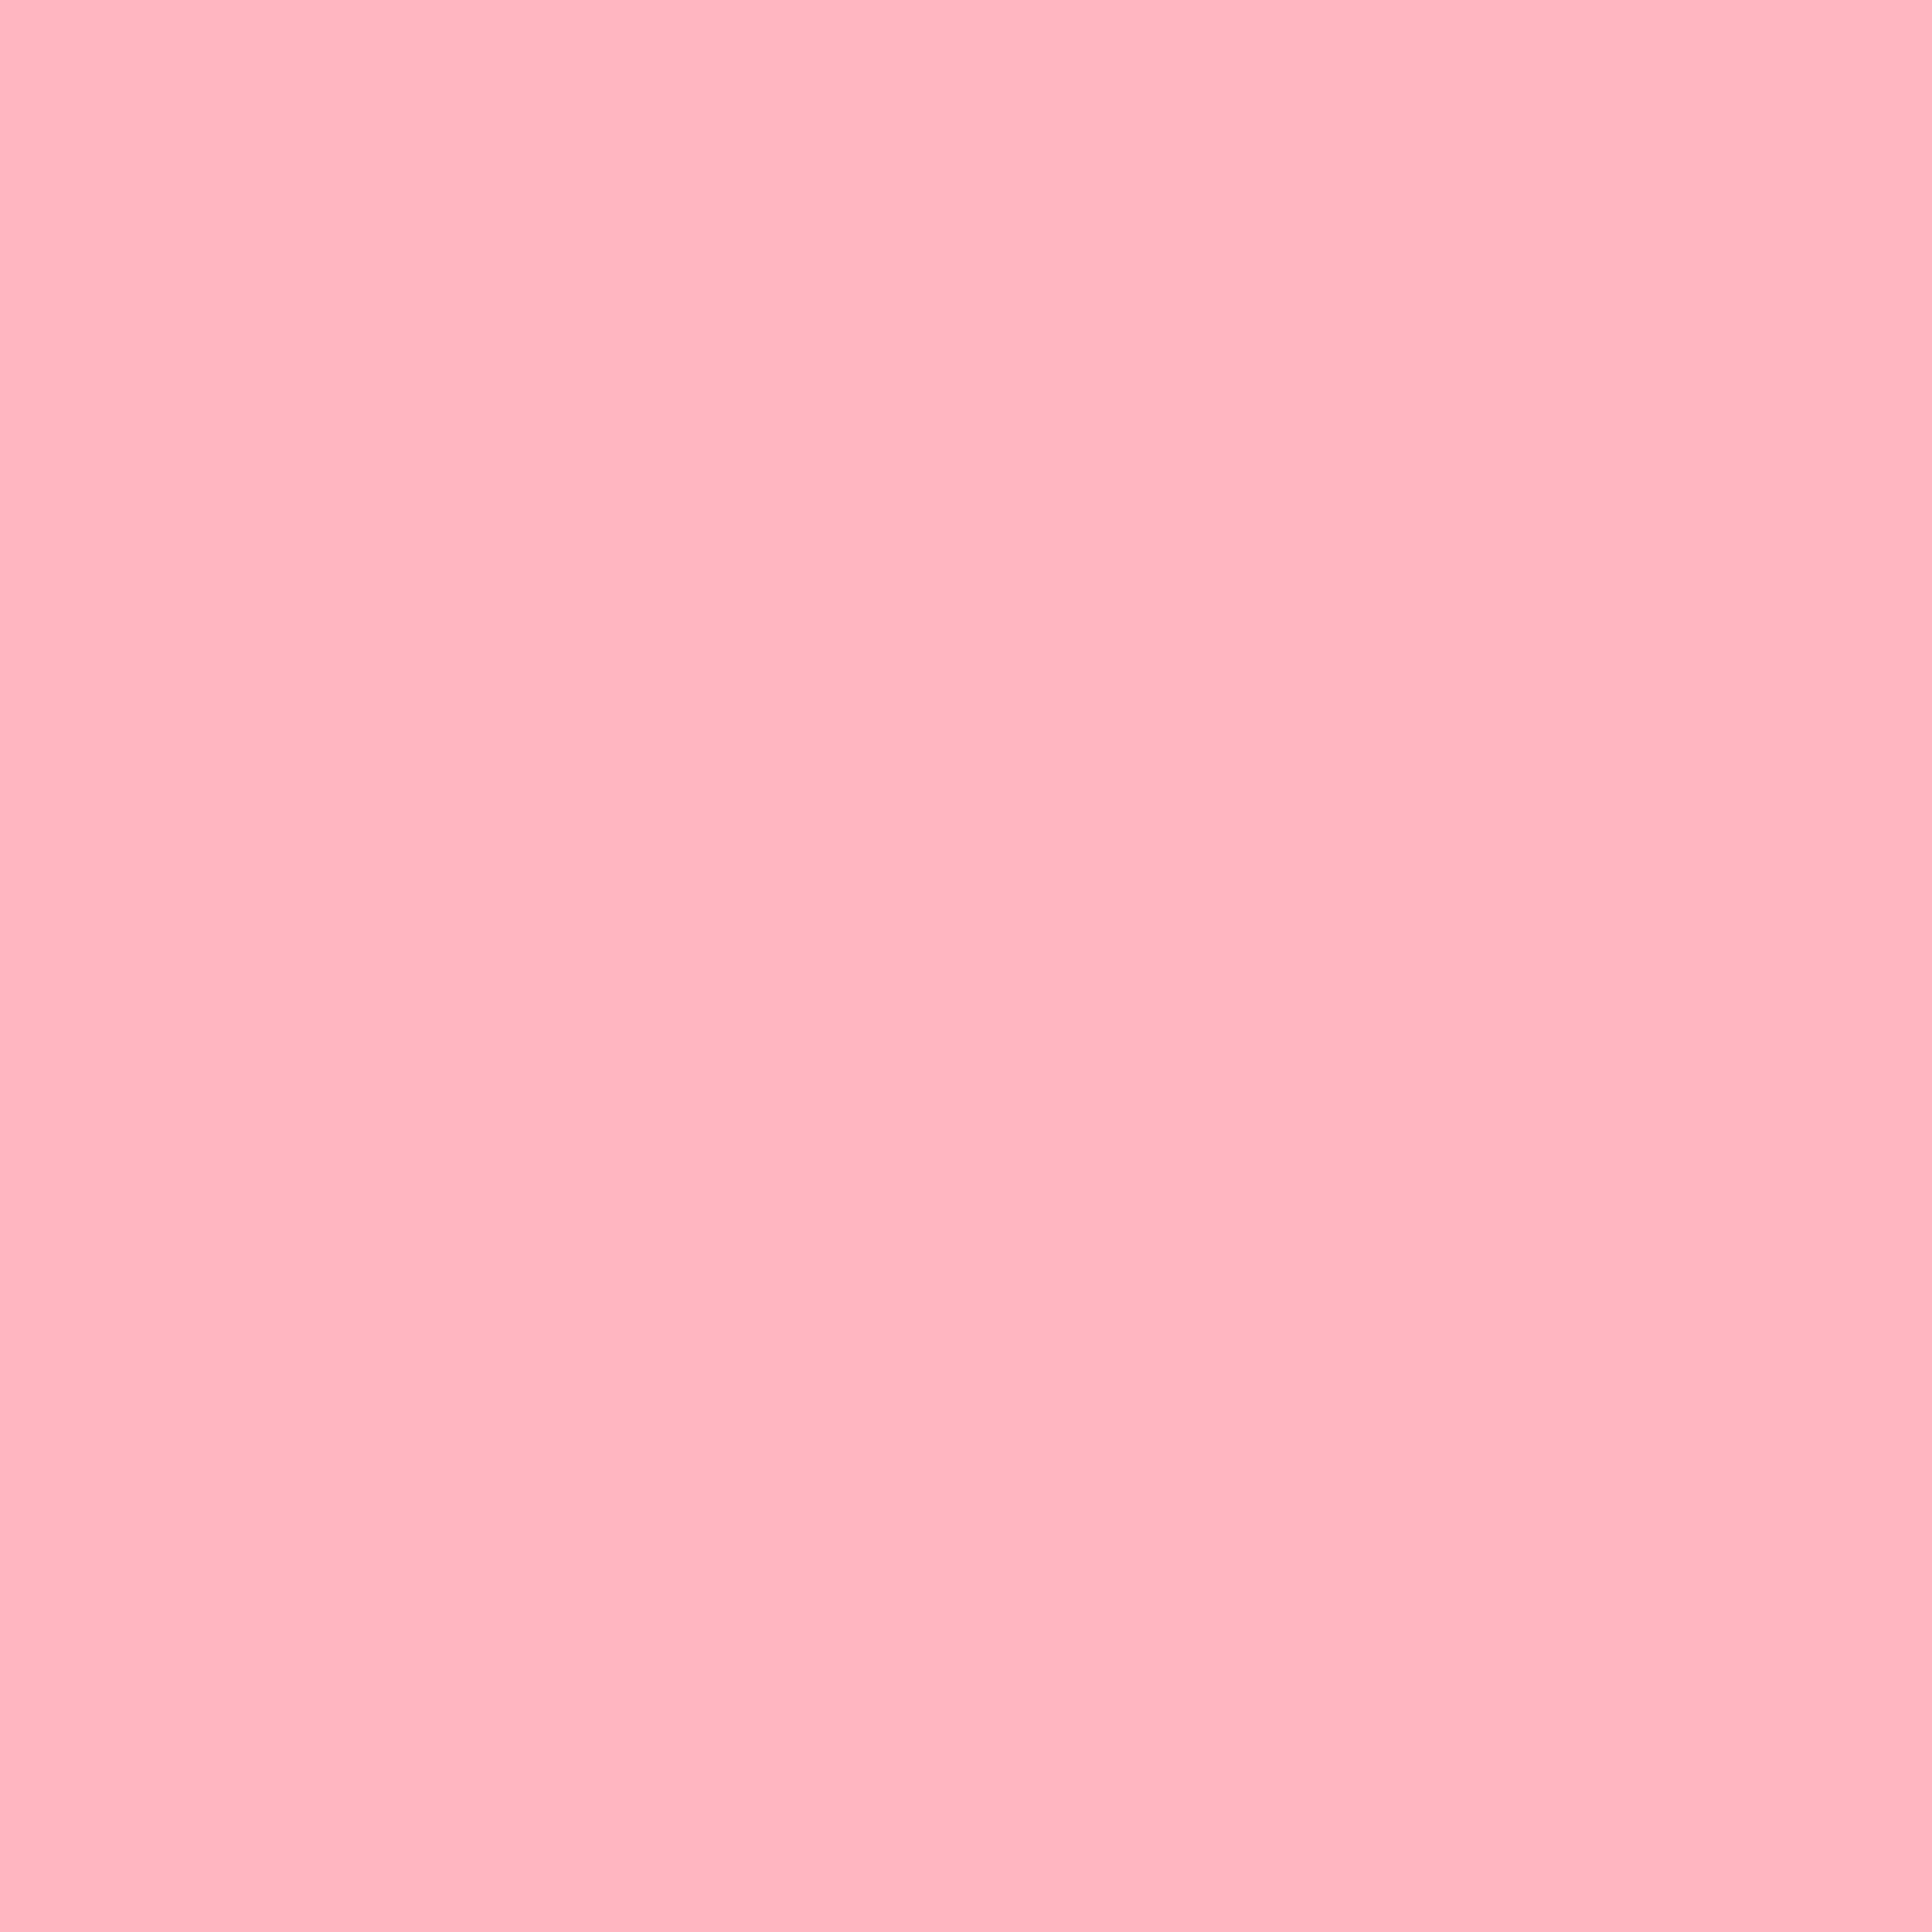 Solid Light Pink Background Tumblr Light pink solid color 2048x2048